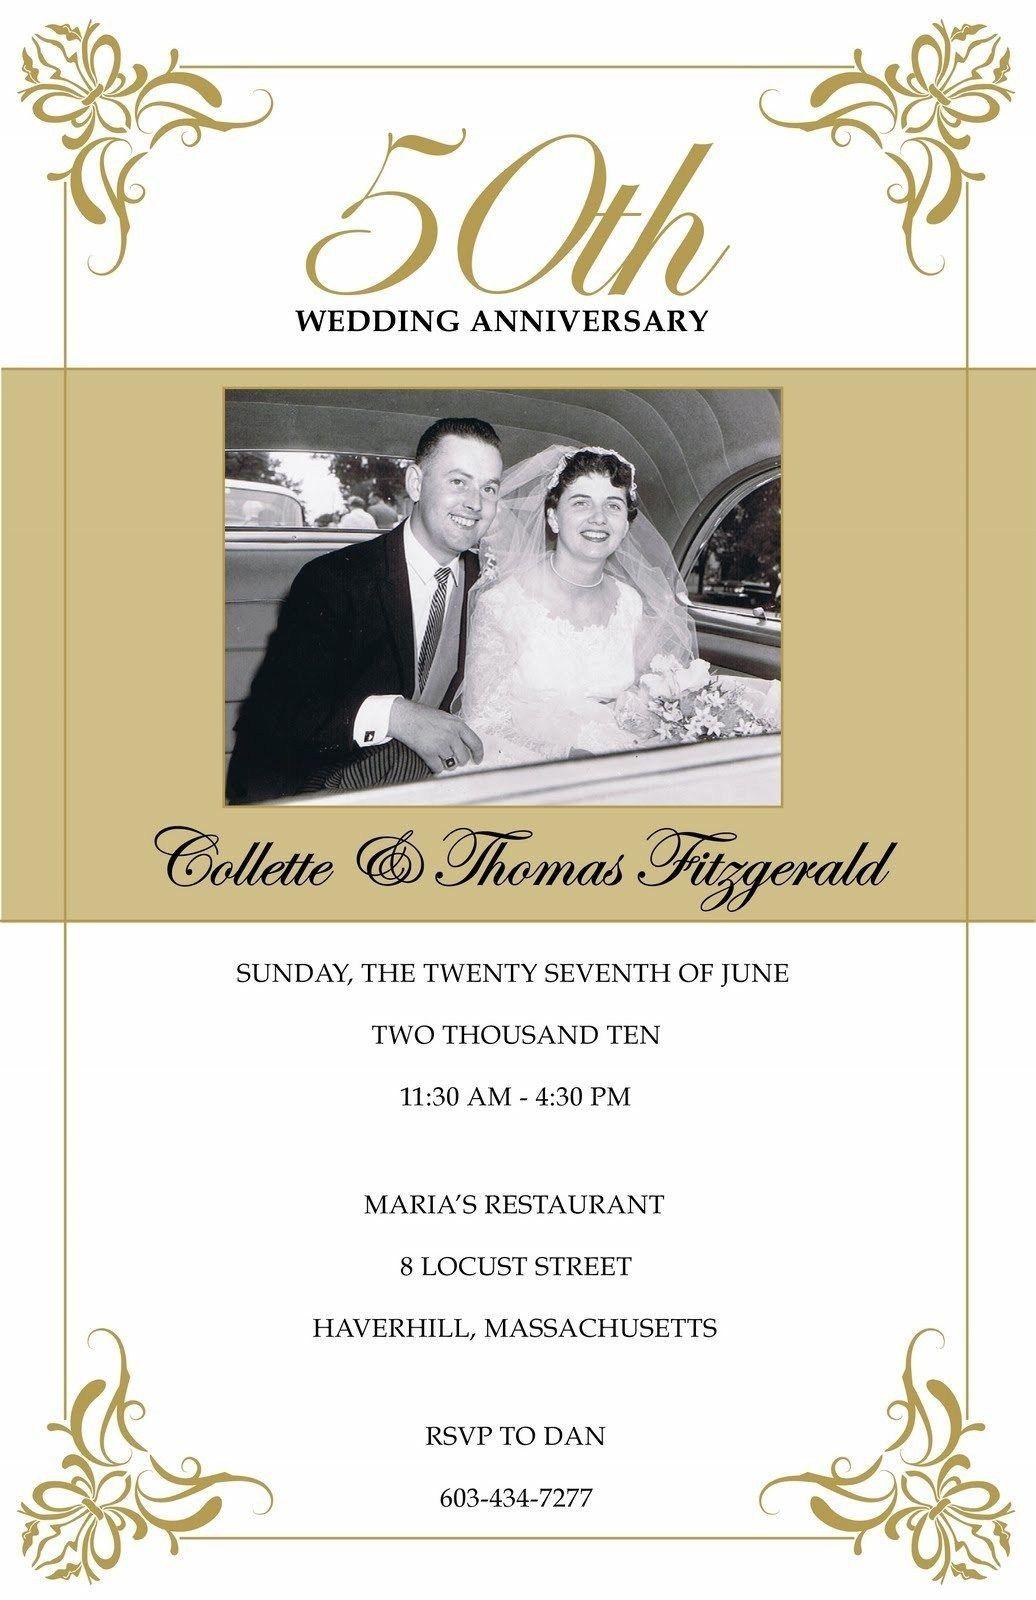 50th Anniversary Invitation Template 50th Wedding Anniversary Party 50th Wedding Anniversary Invitations 50th Anniversary Invitations